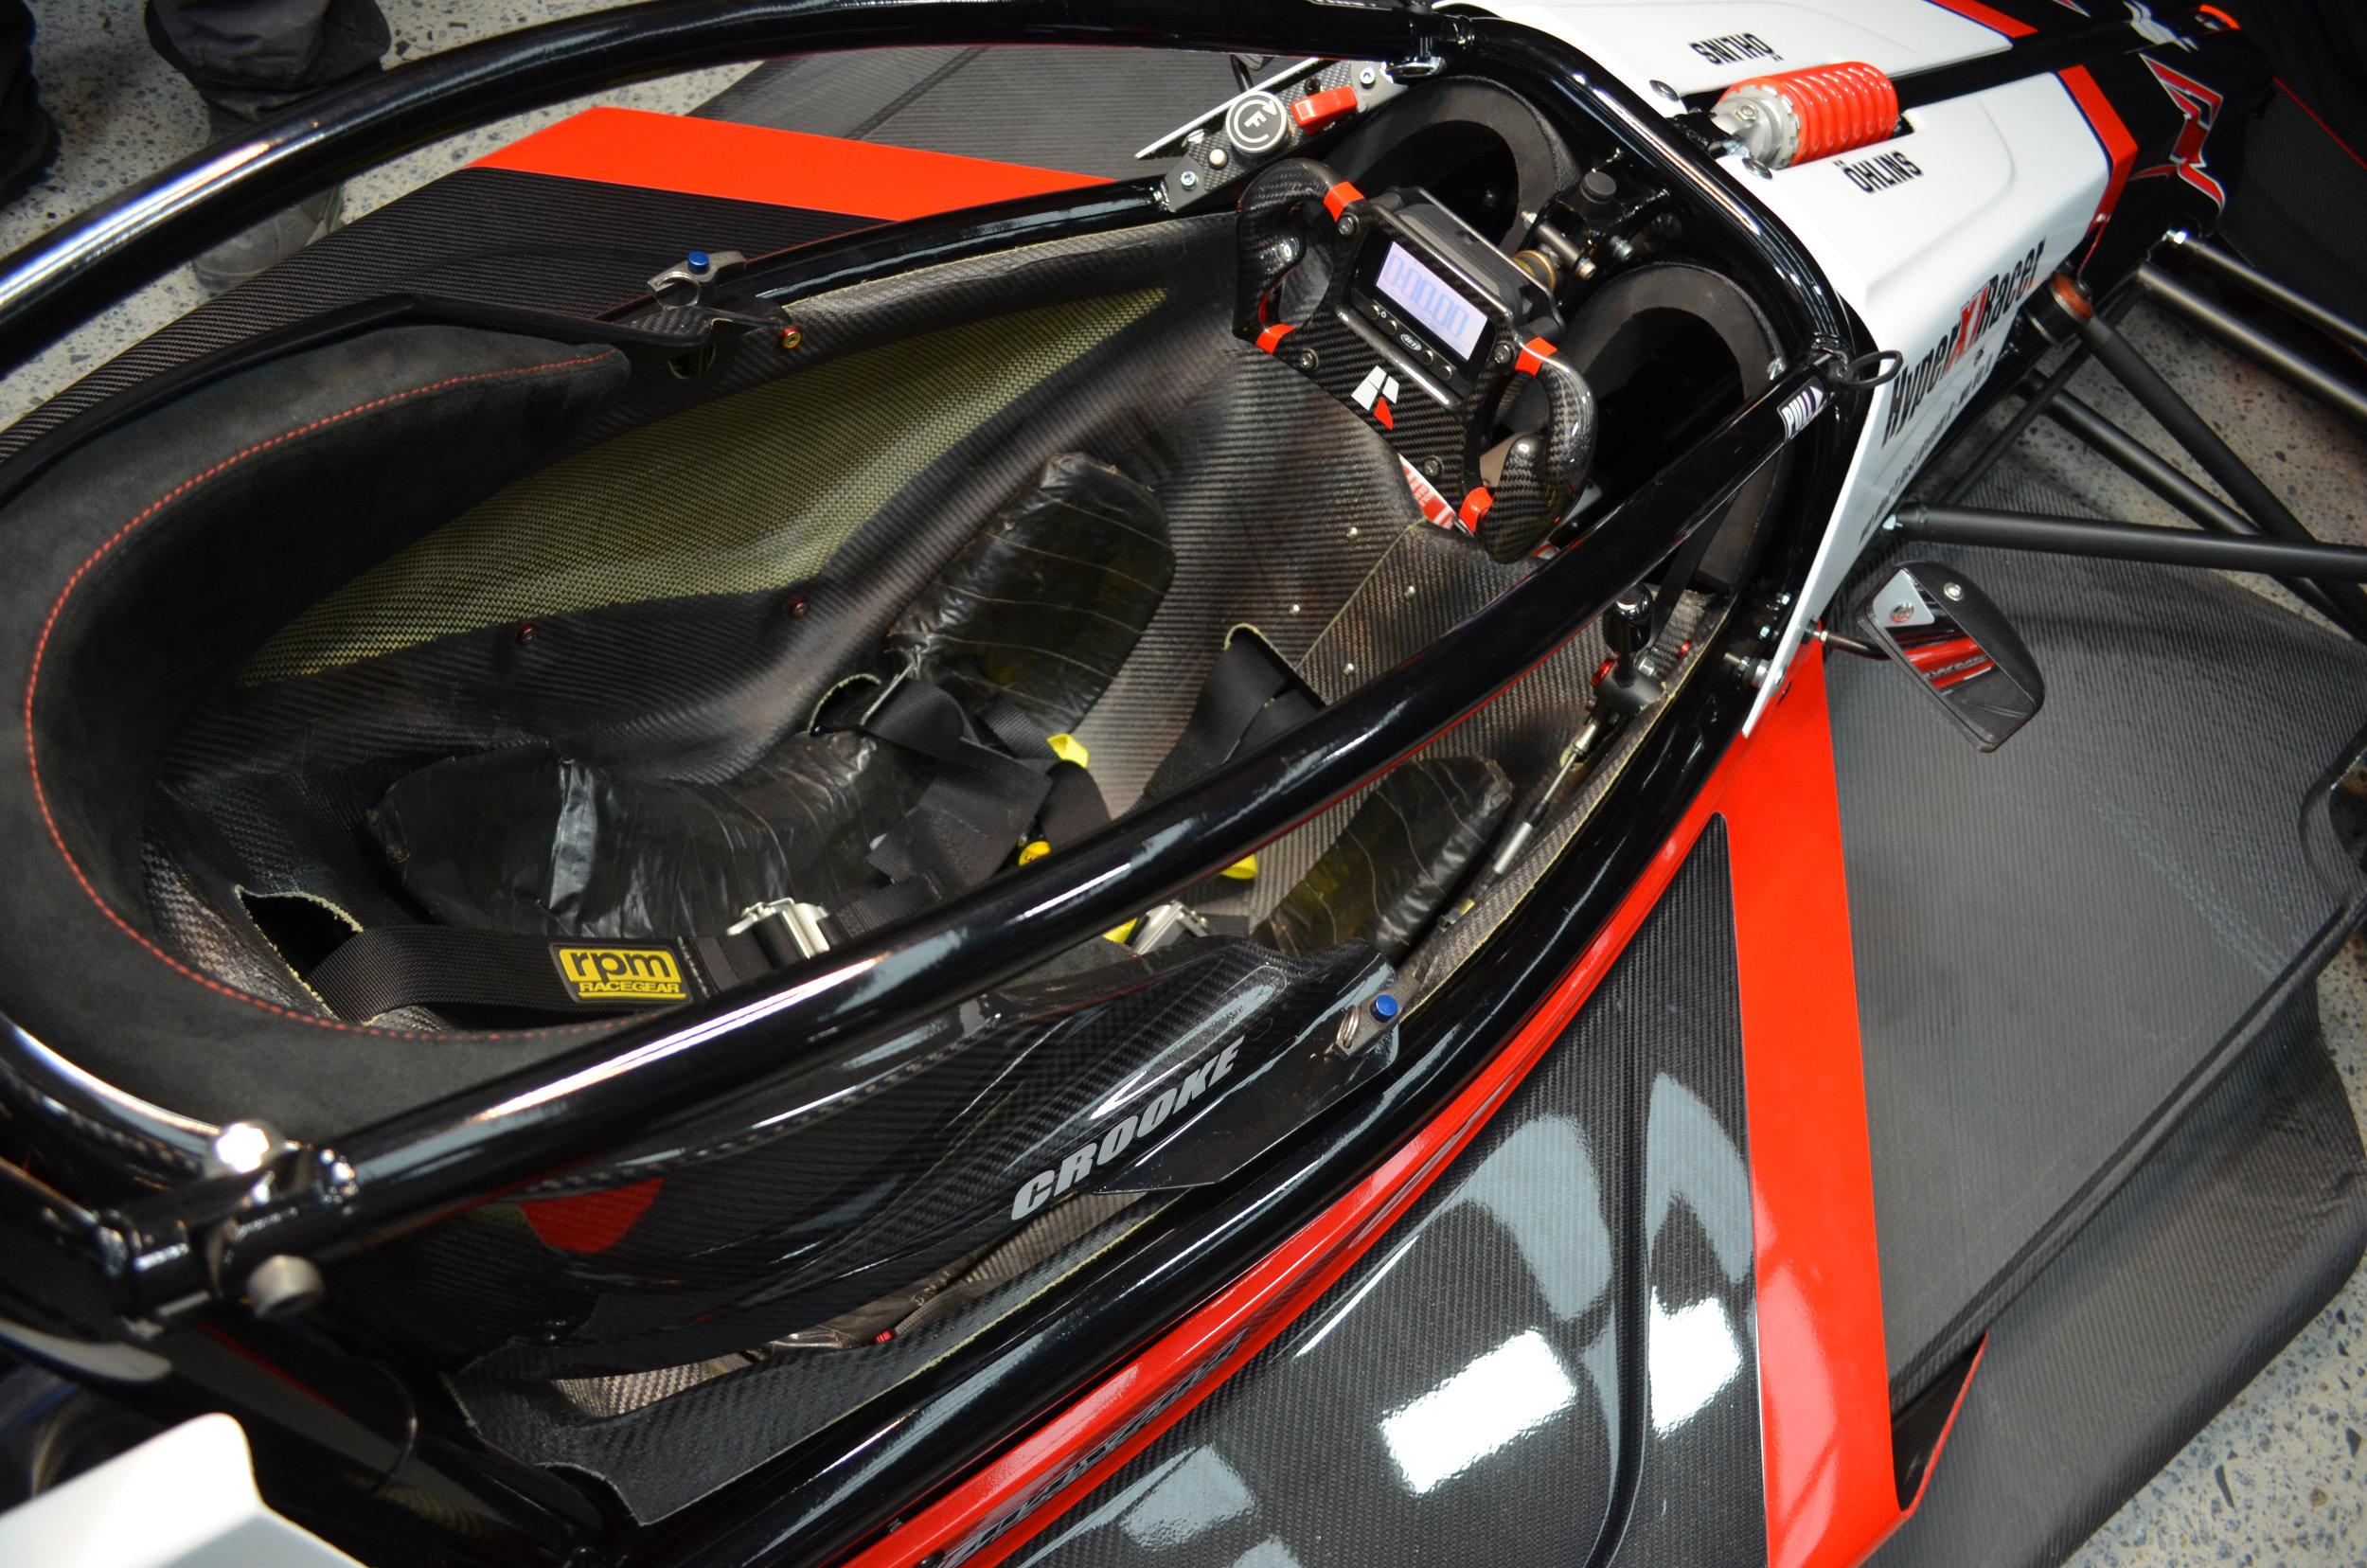 HyperX1Racer cockpit 1s